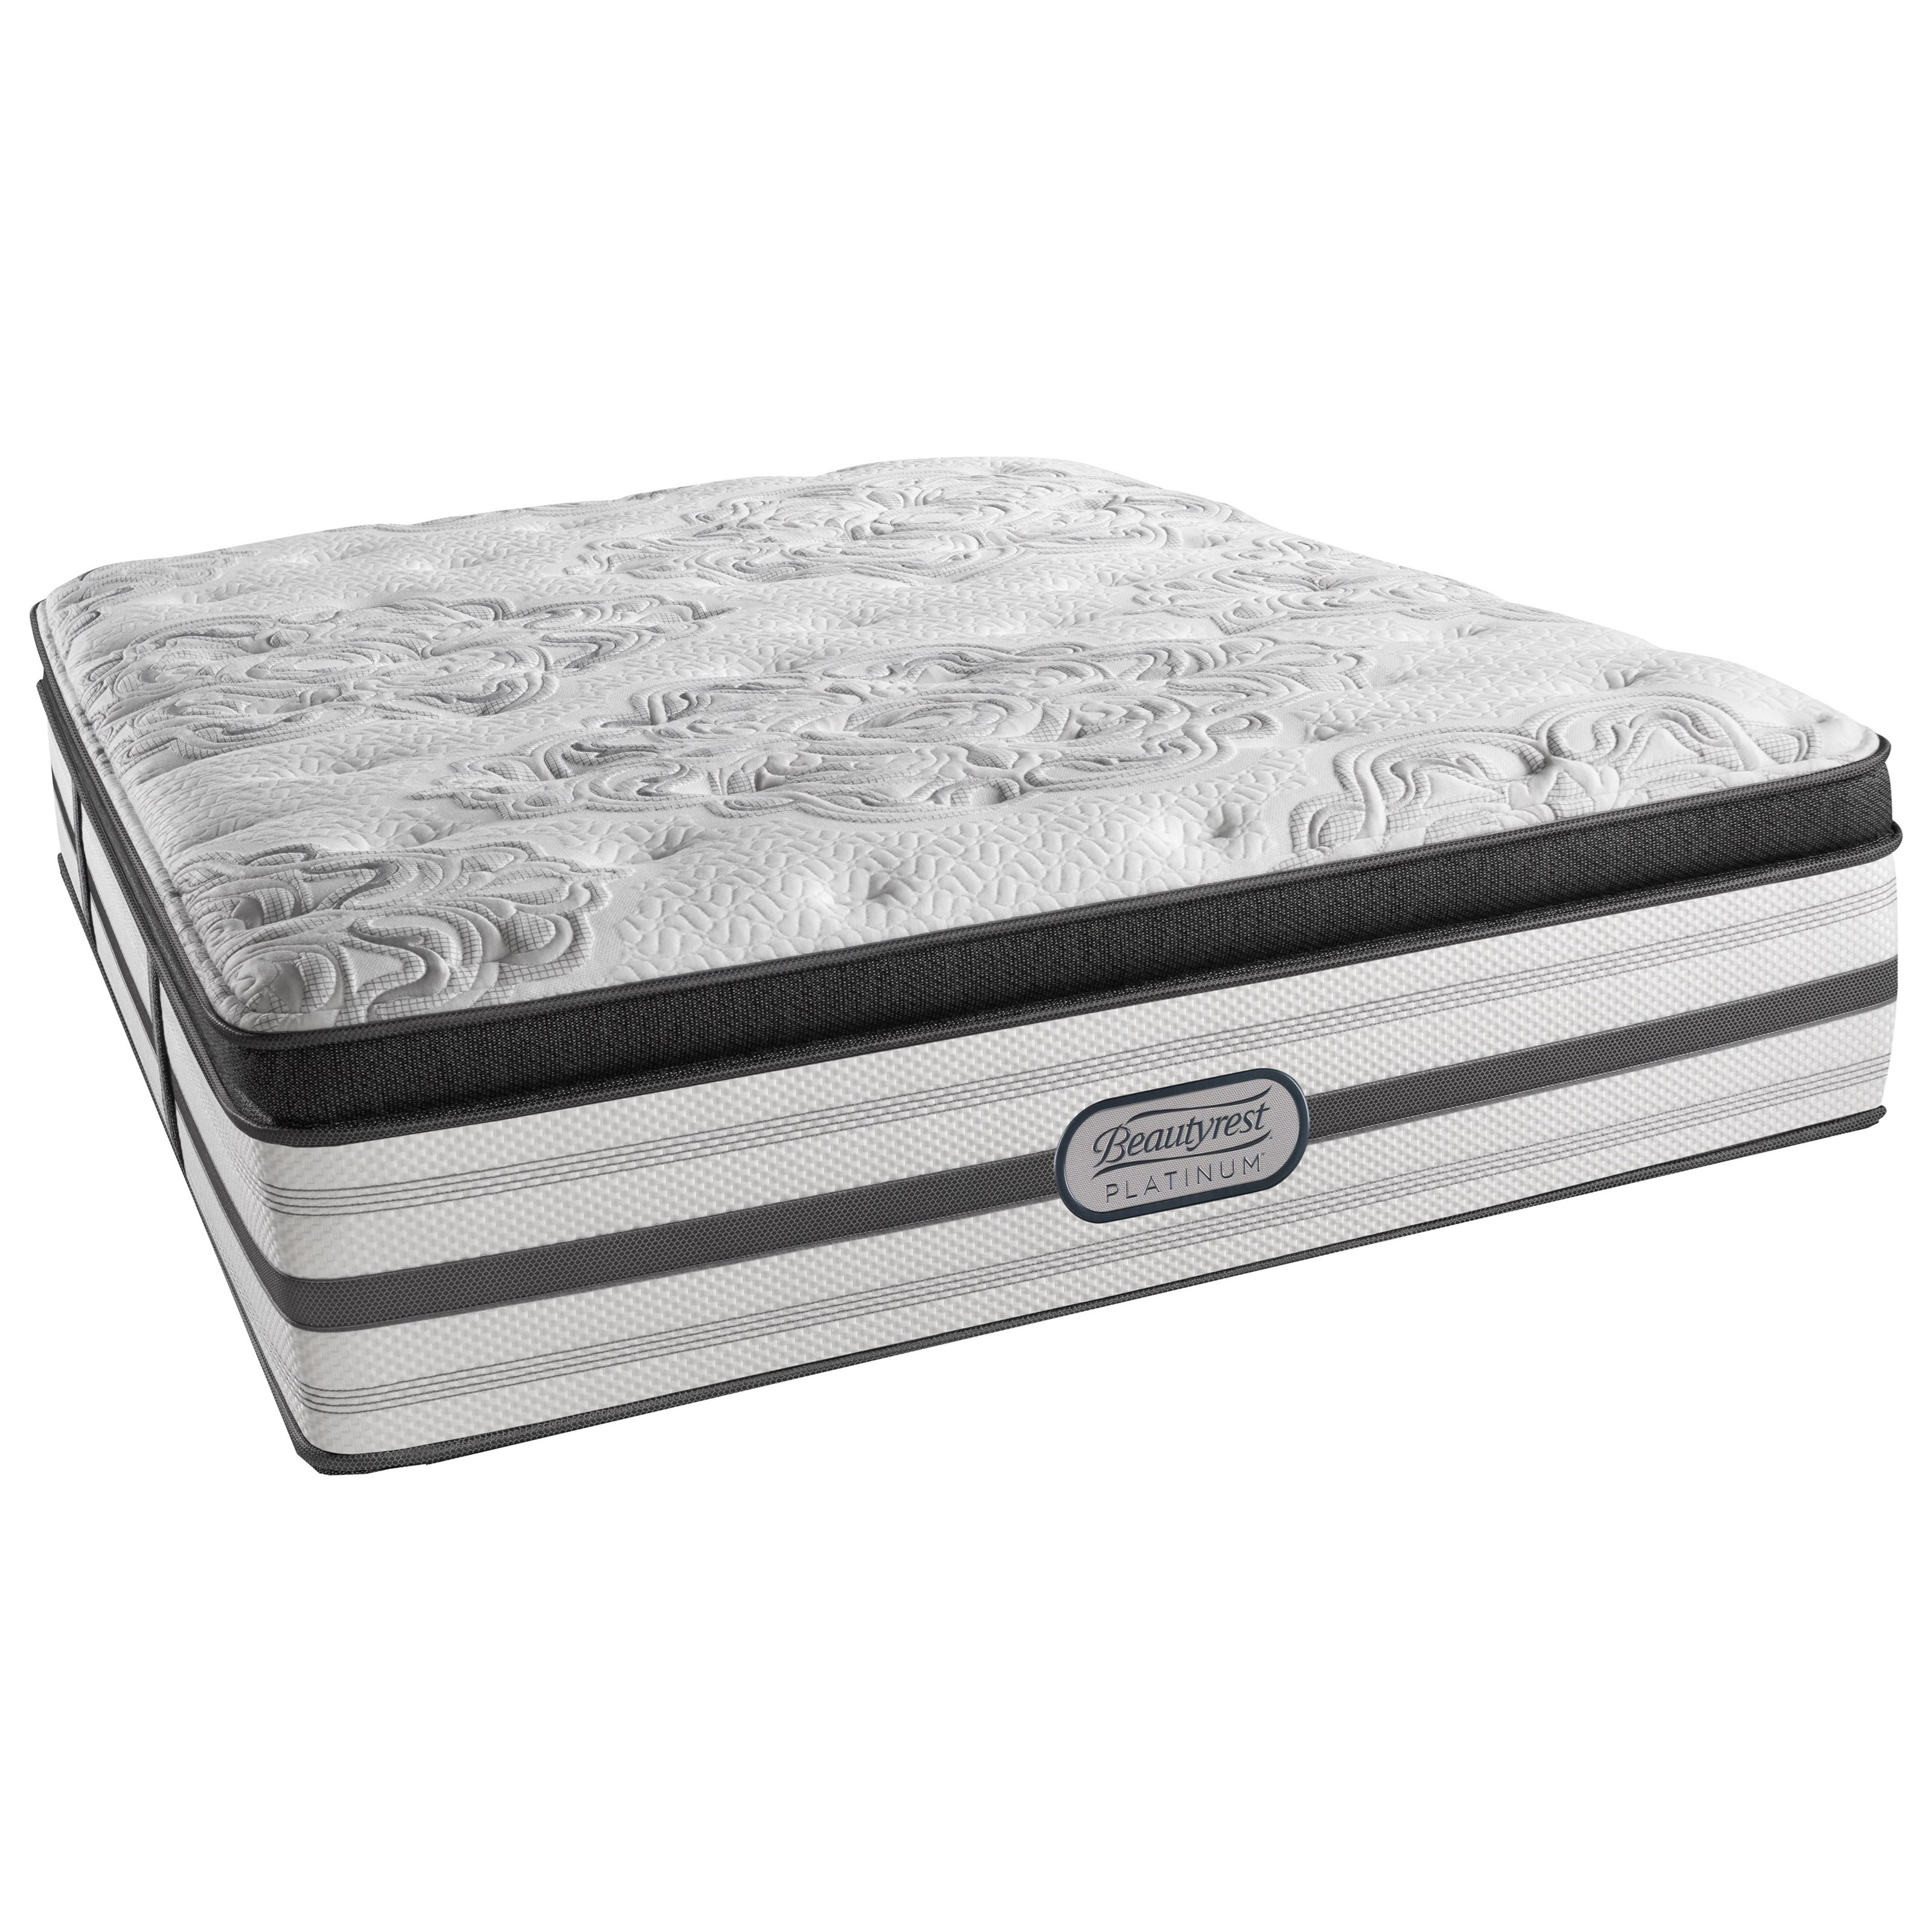 Beautyrest Platinum Katherine King Plush Box Top Adjustable Set - Item Number: LV4PLBT-K+2xSM2-TXLK